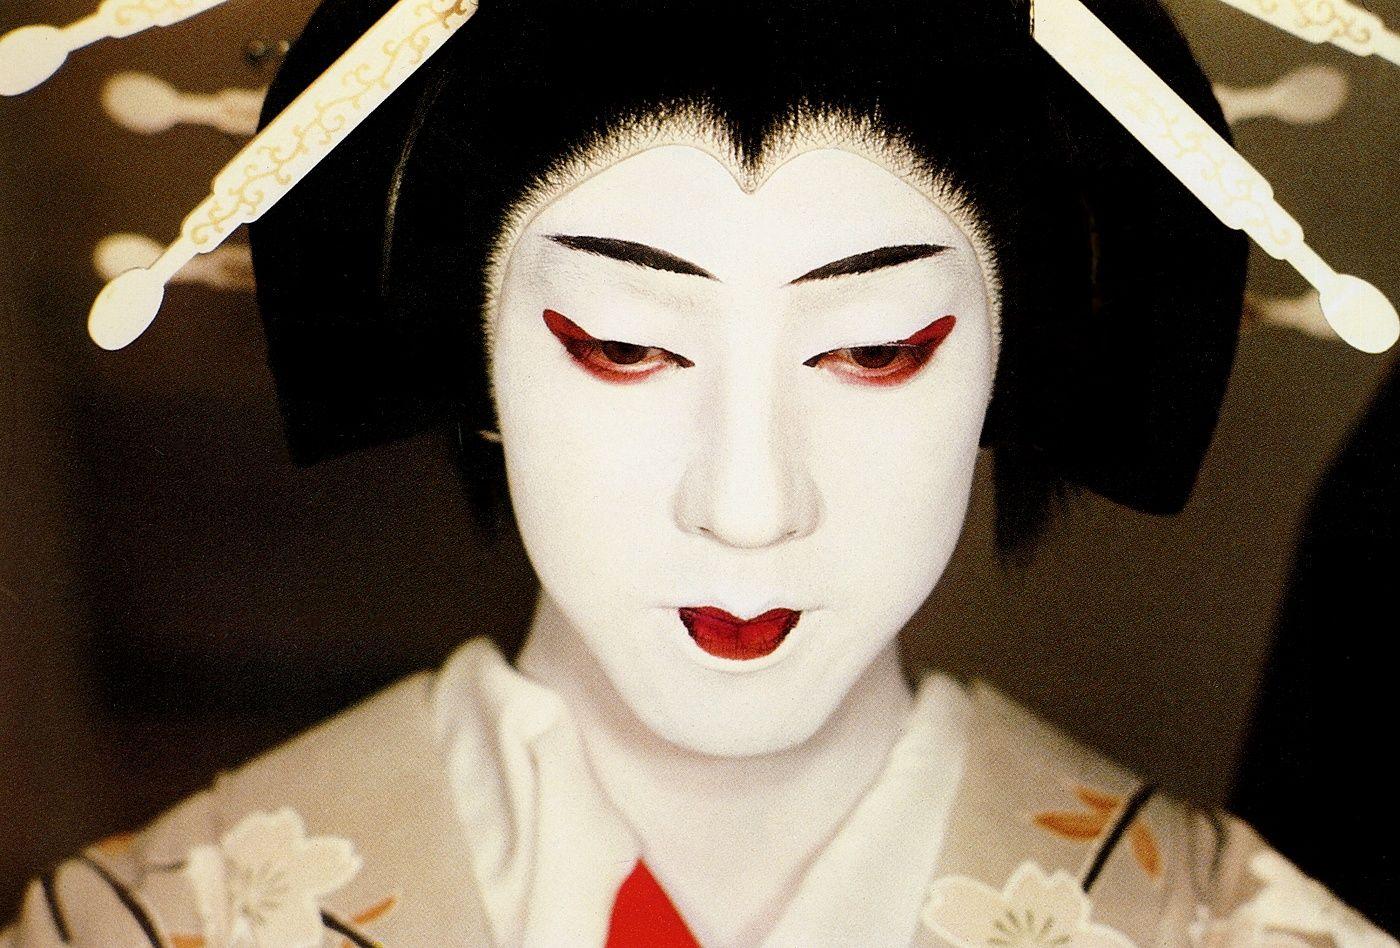 Le Theatre Japonais Kabuki The Japanese Theater Kabuki Japon Theatre Ikebana